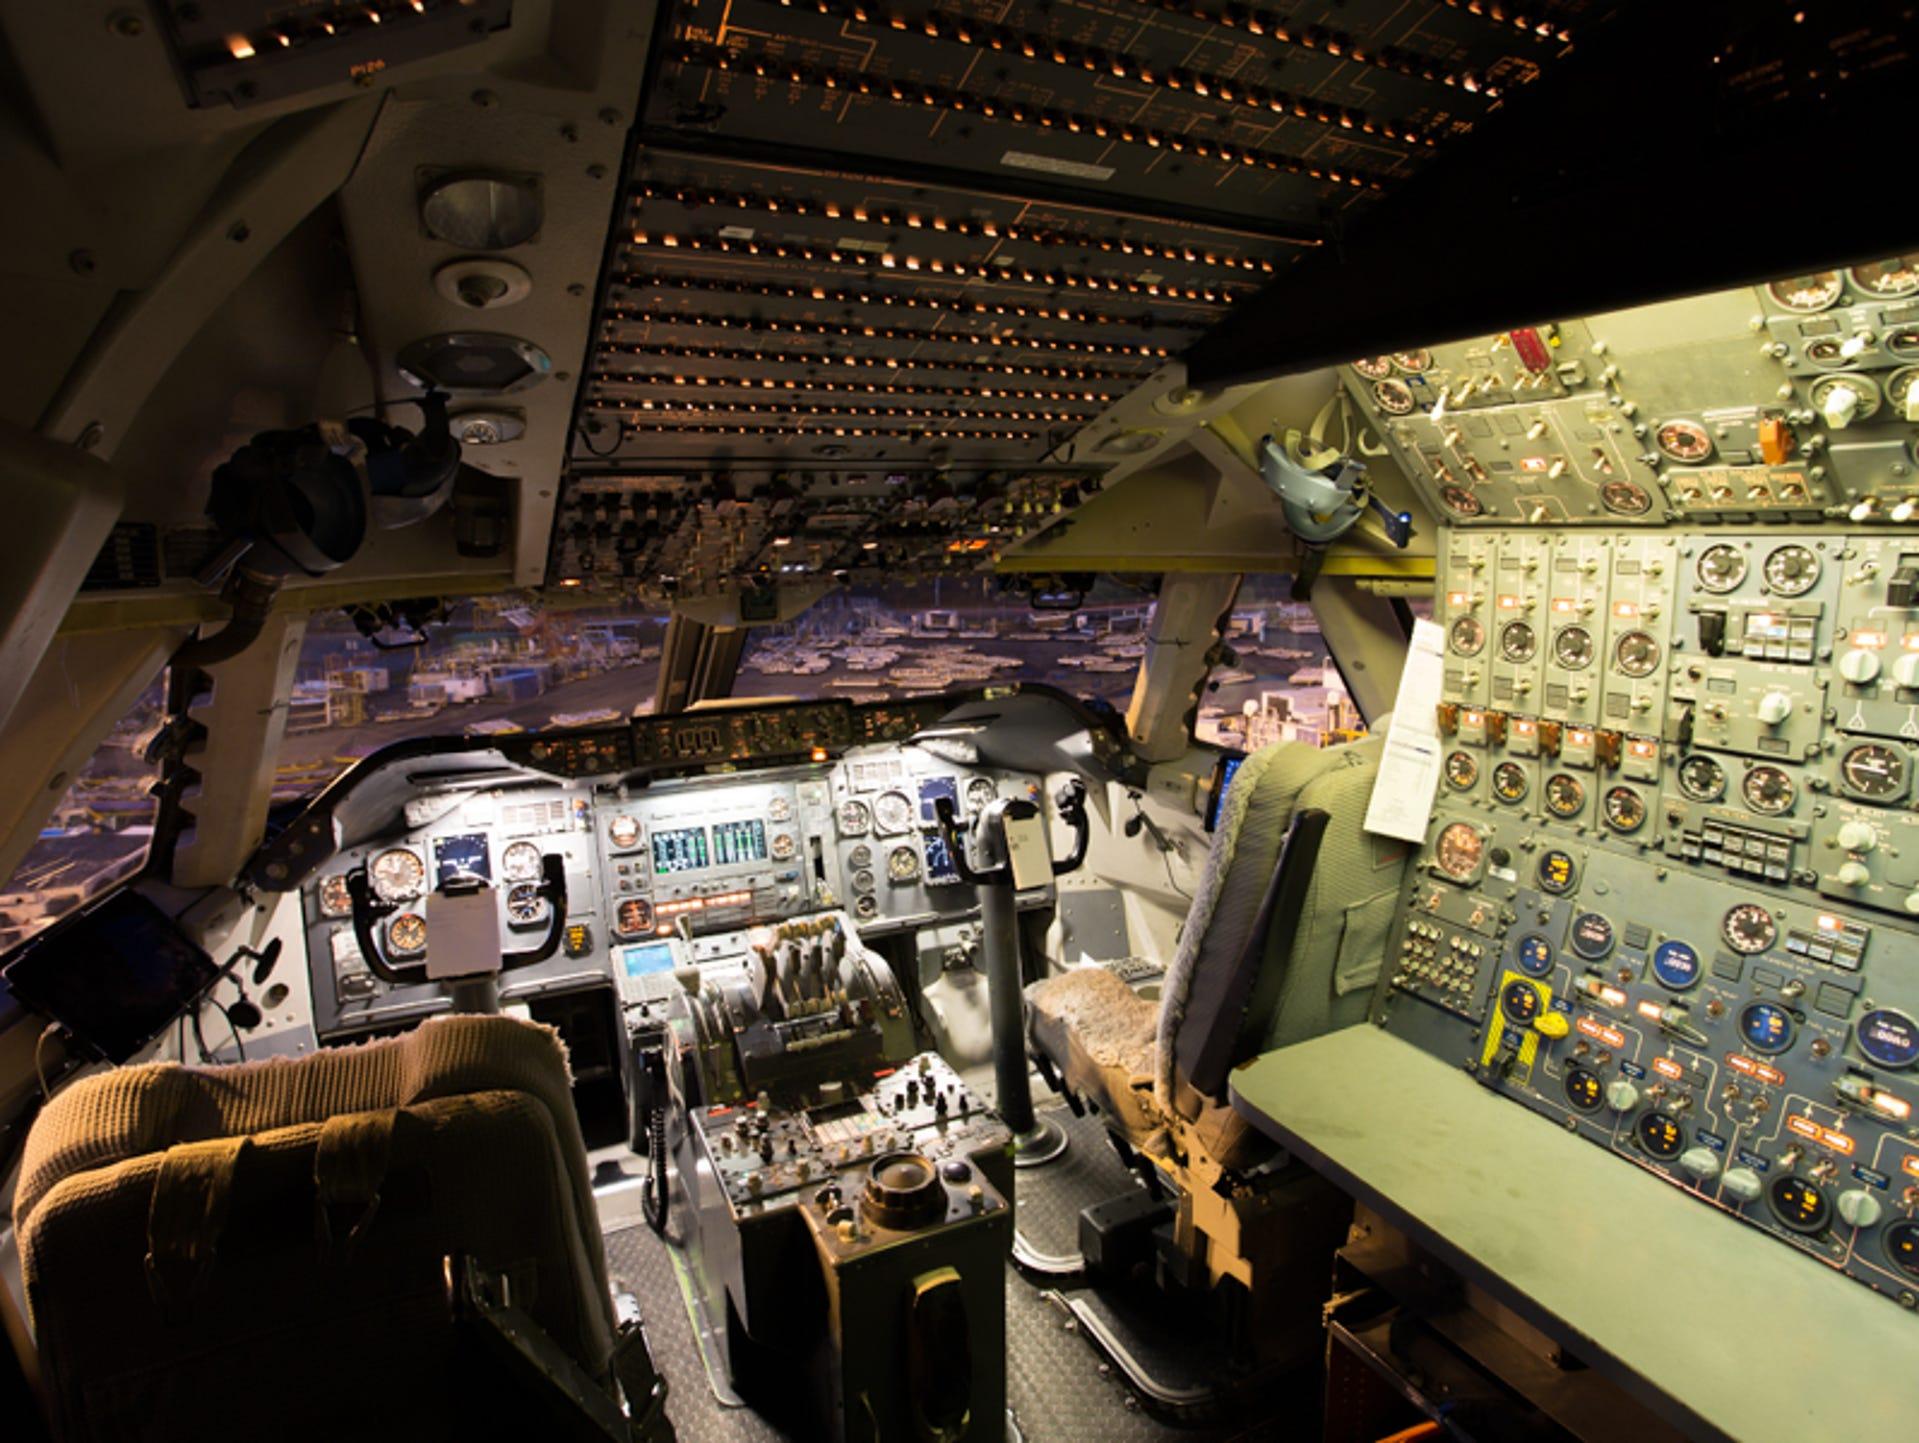 636283627145061863-2017-04-20-Kalitta-Air-last-747-200-17.jpg